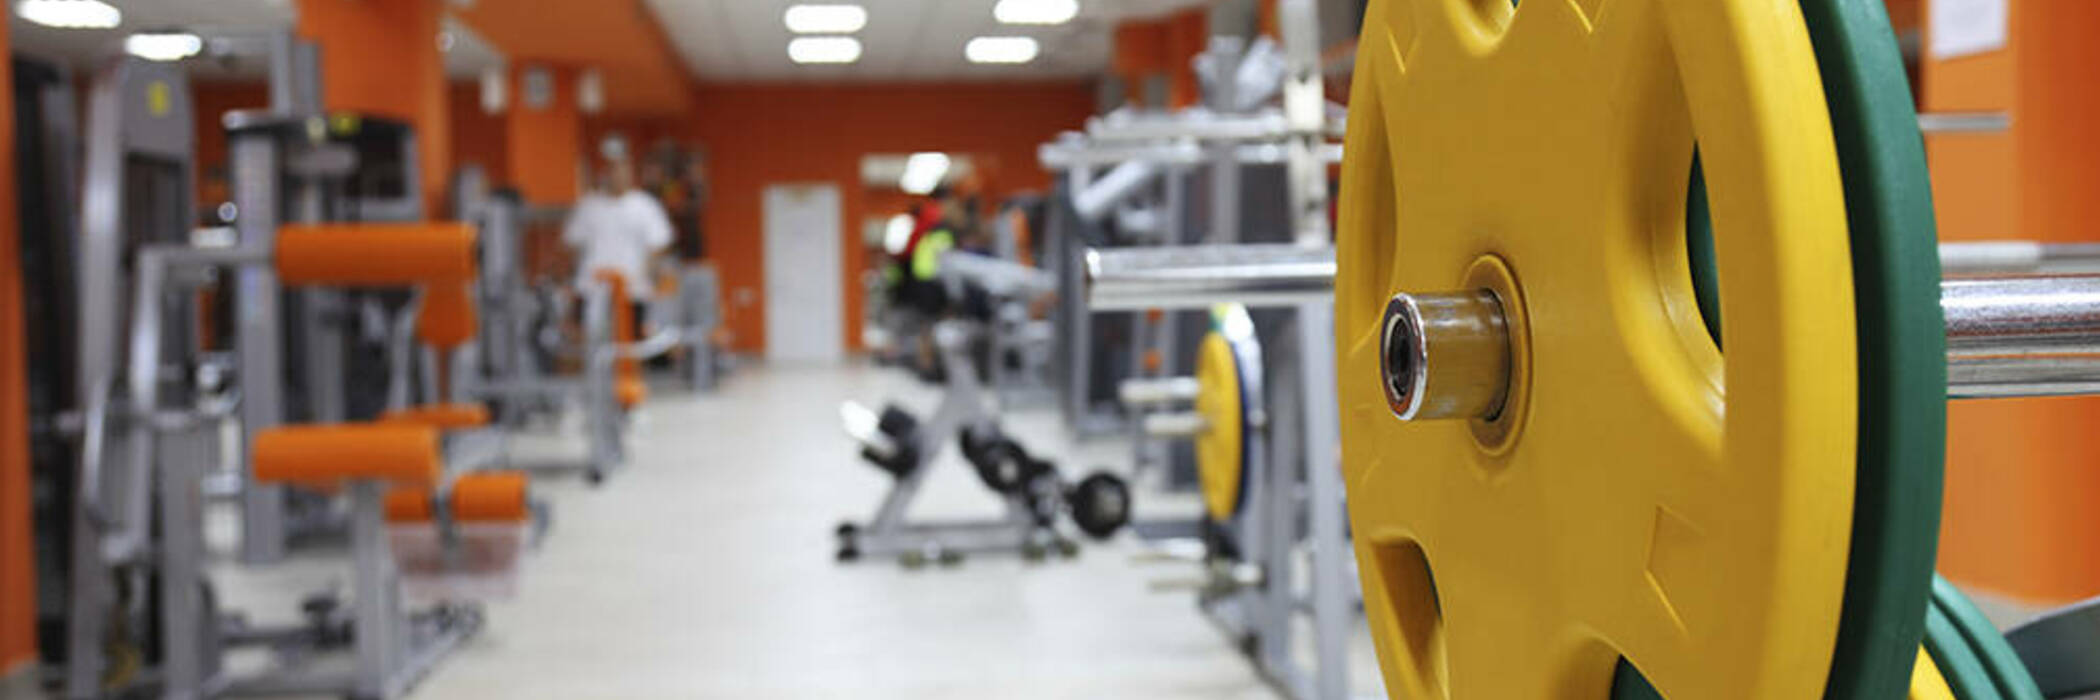 16feb gyms risk breaching hero